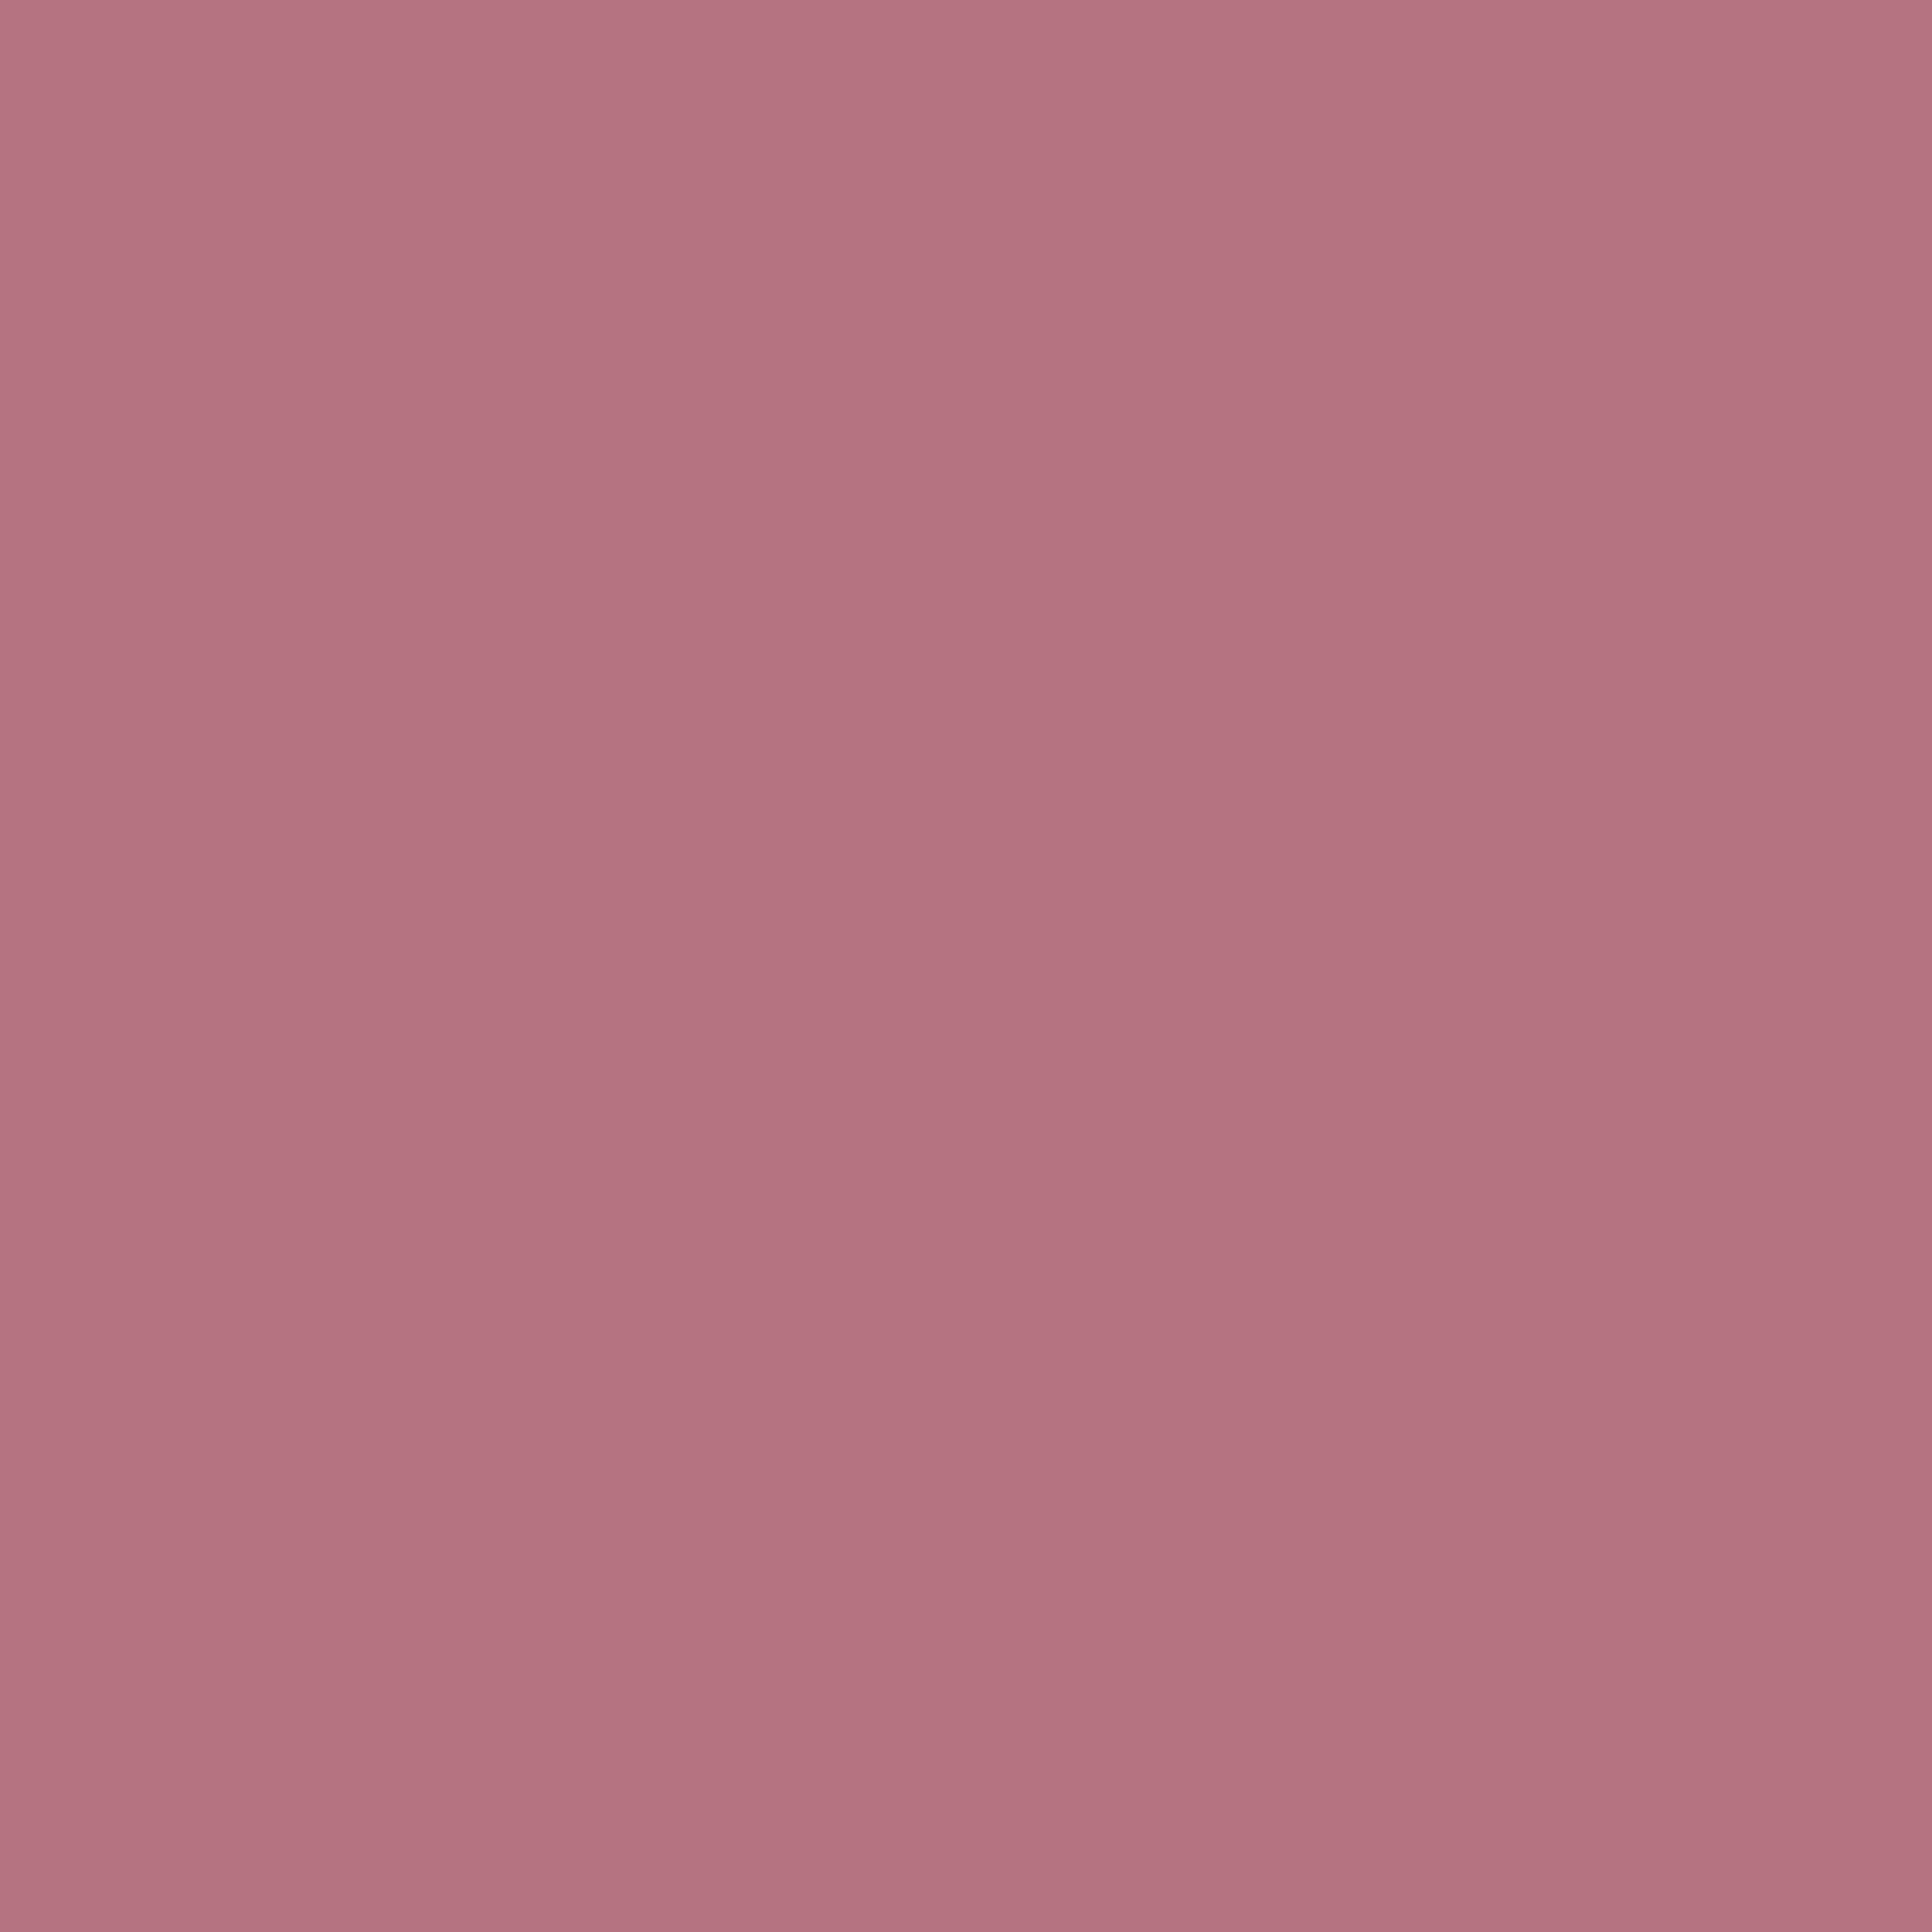 2048x2048 Turkish Rose Solid Color Background